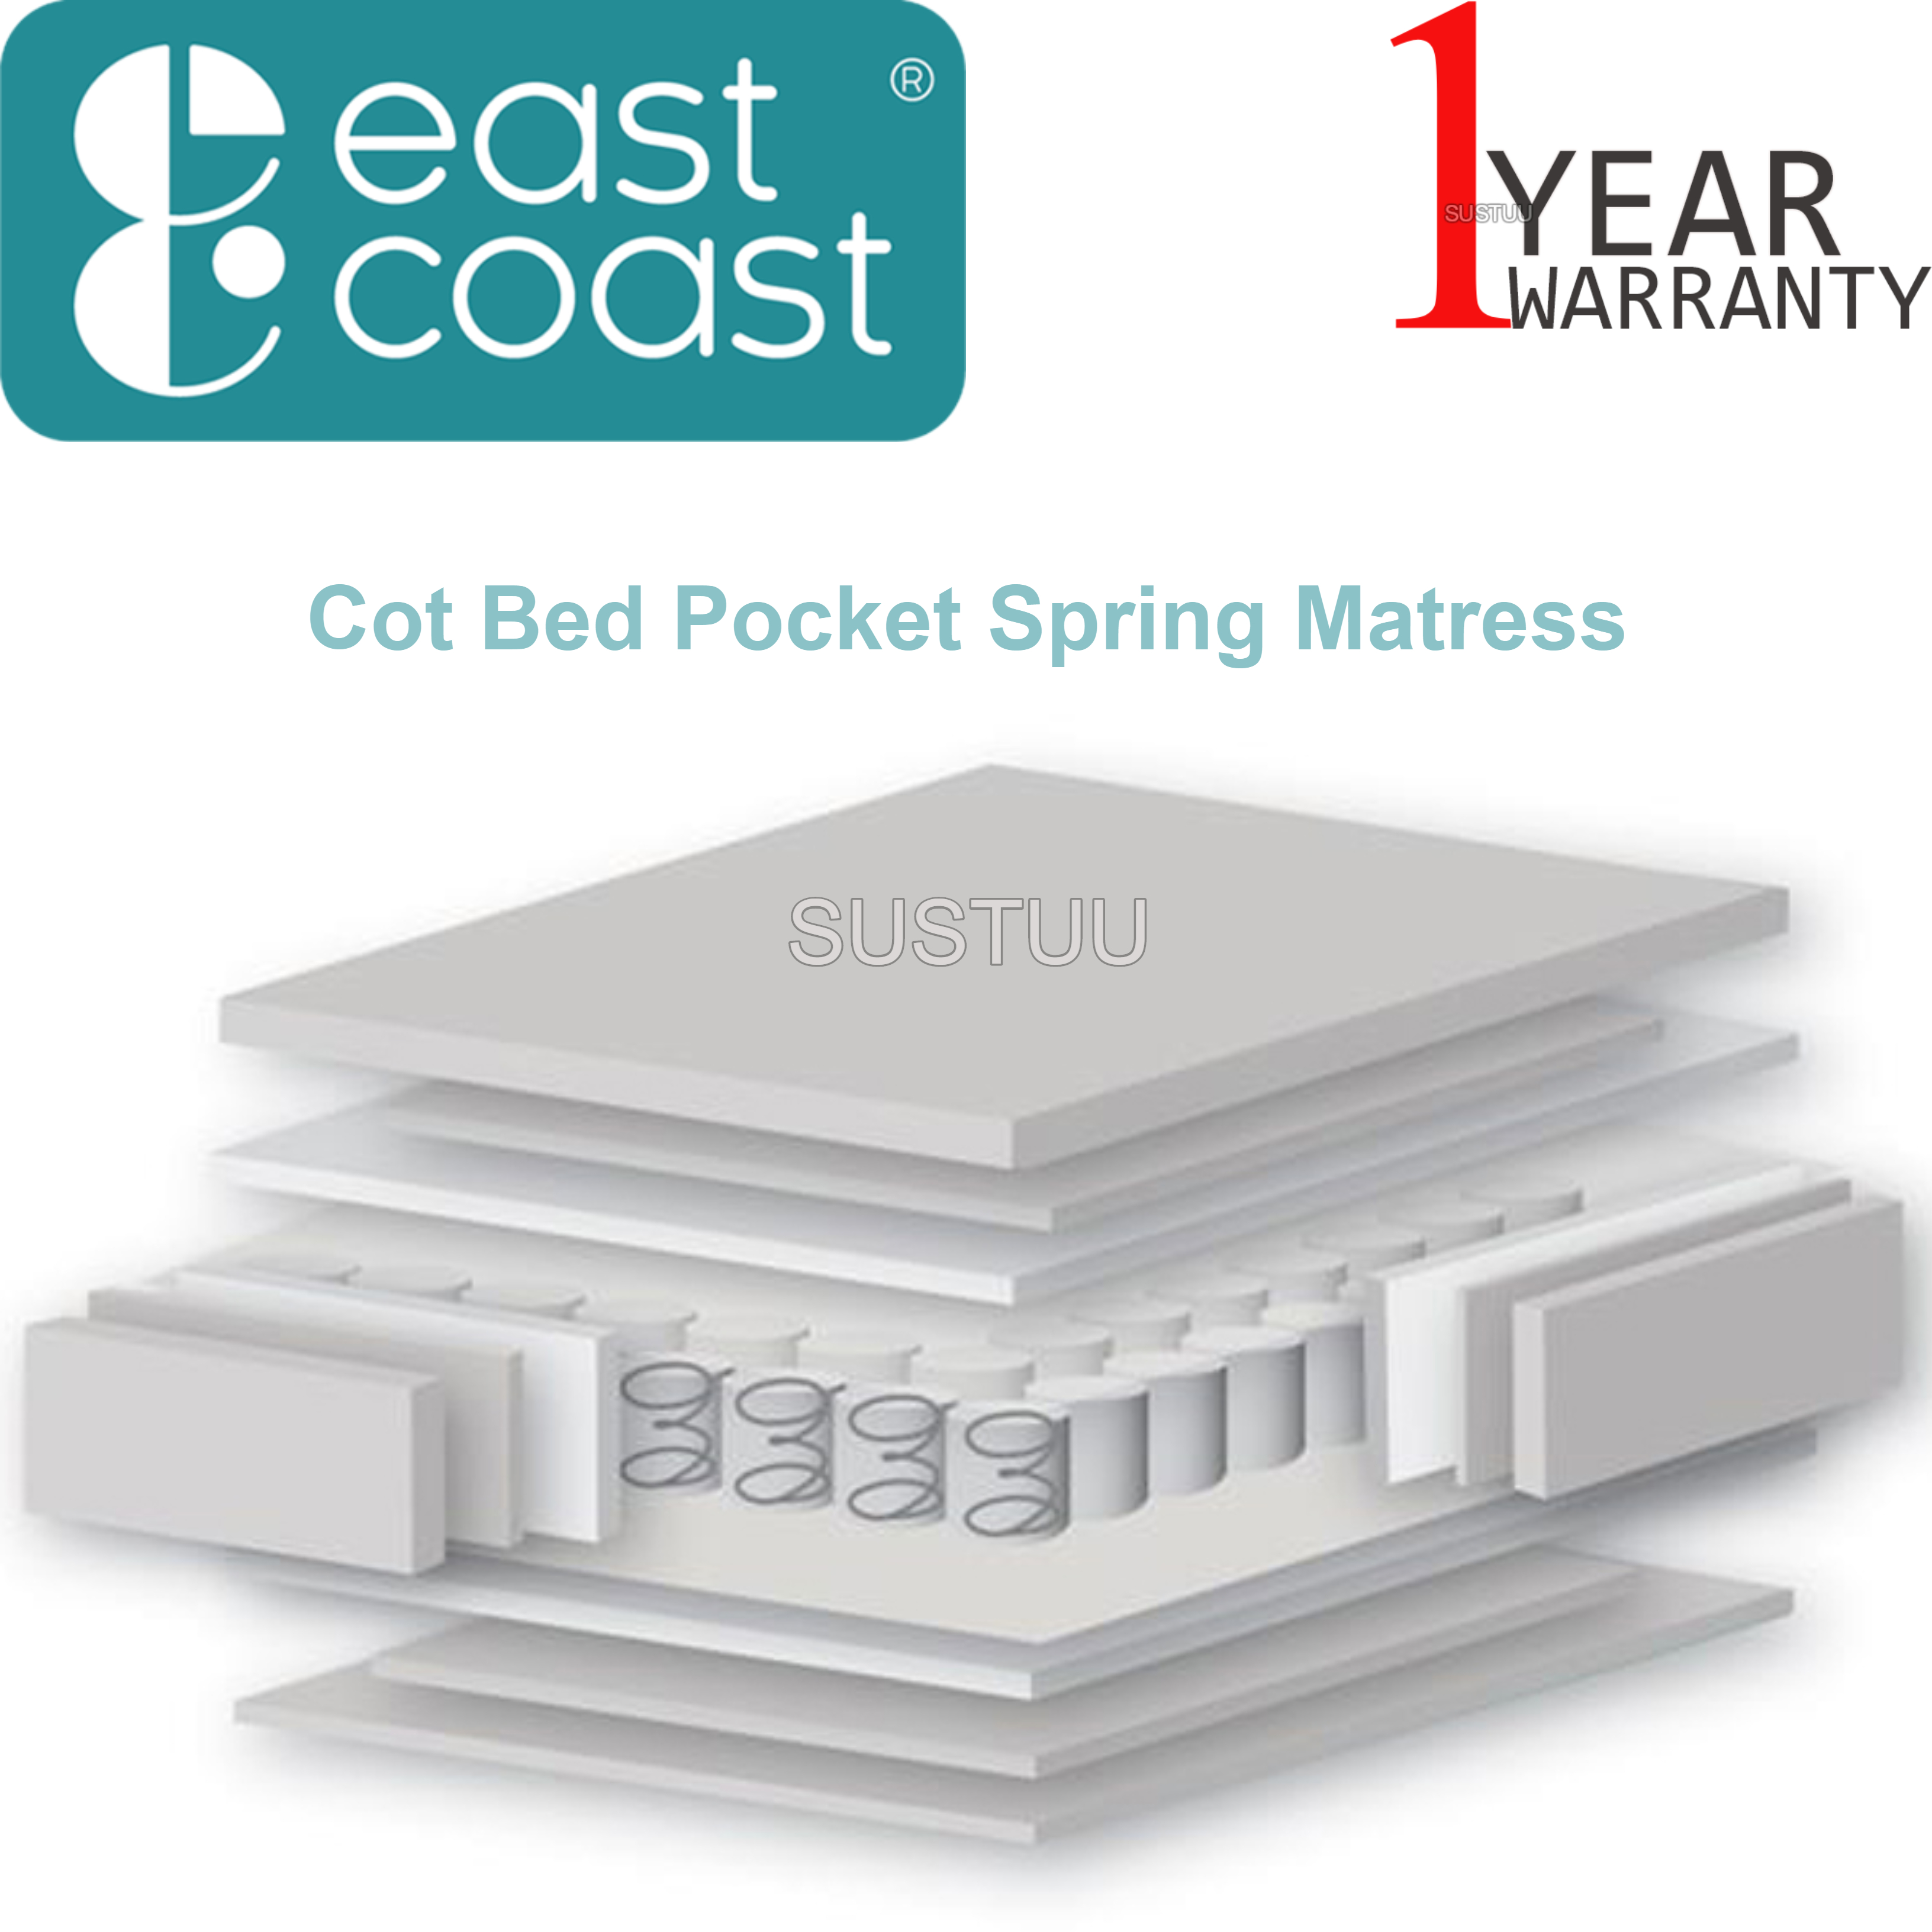 East Coast Kids Cot Bed Pocket Spring Matress (140 cm x 70 cm) | Soft & Comfortable